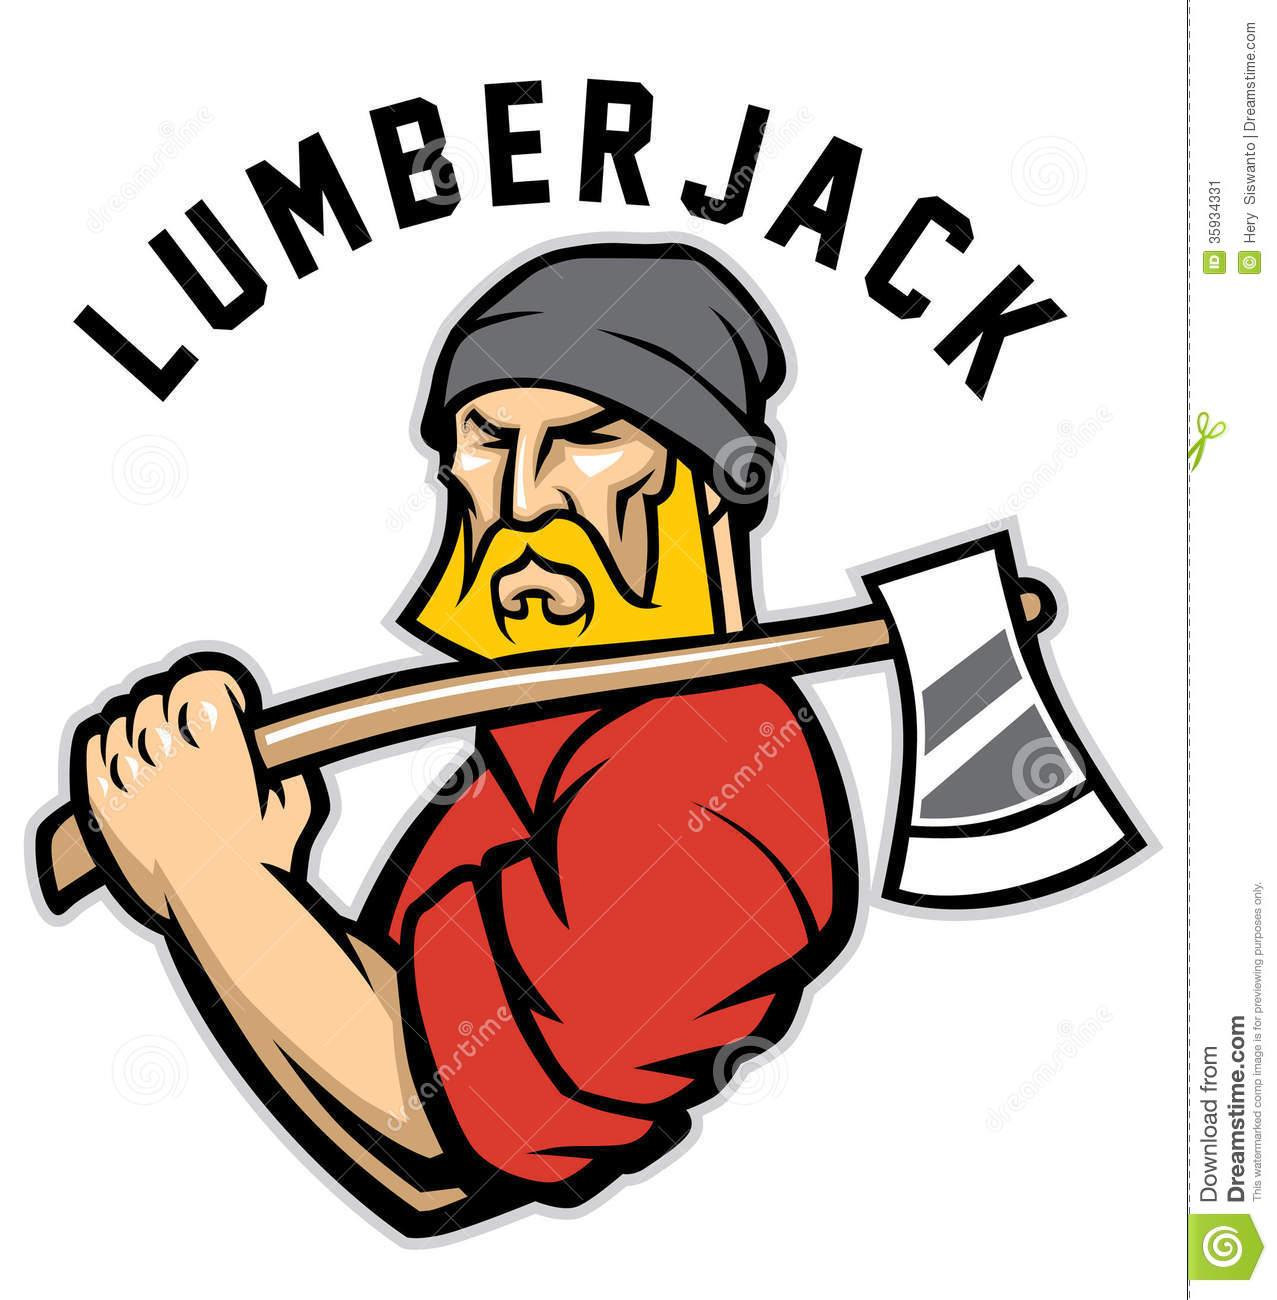 Clipground vector of mascot. Ax clipart lumberjack